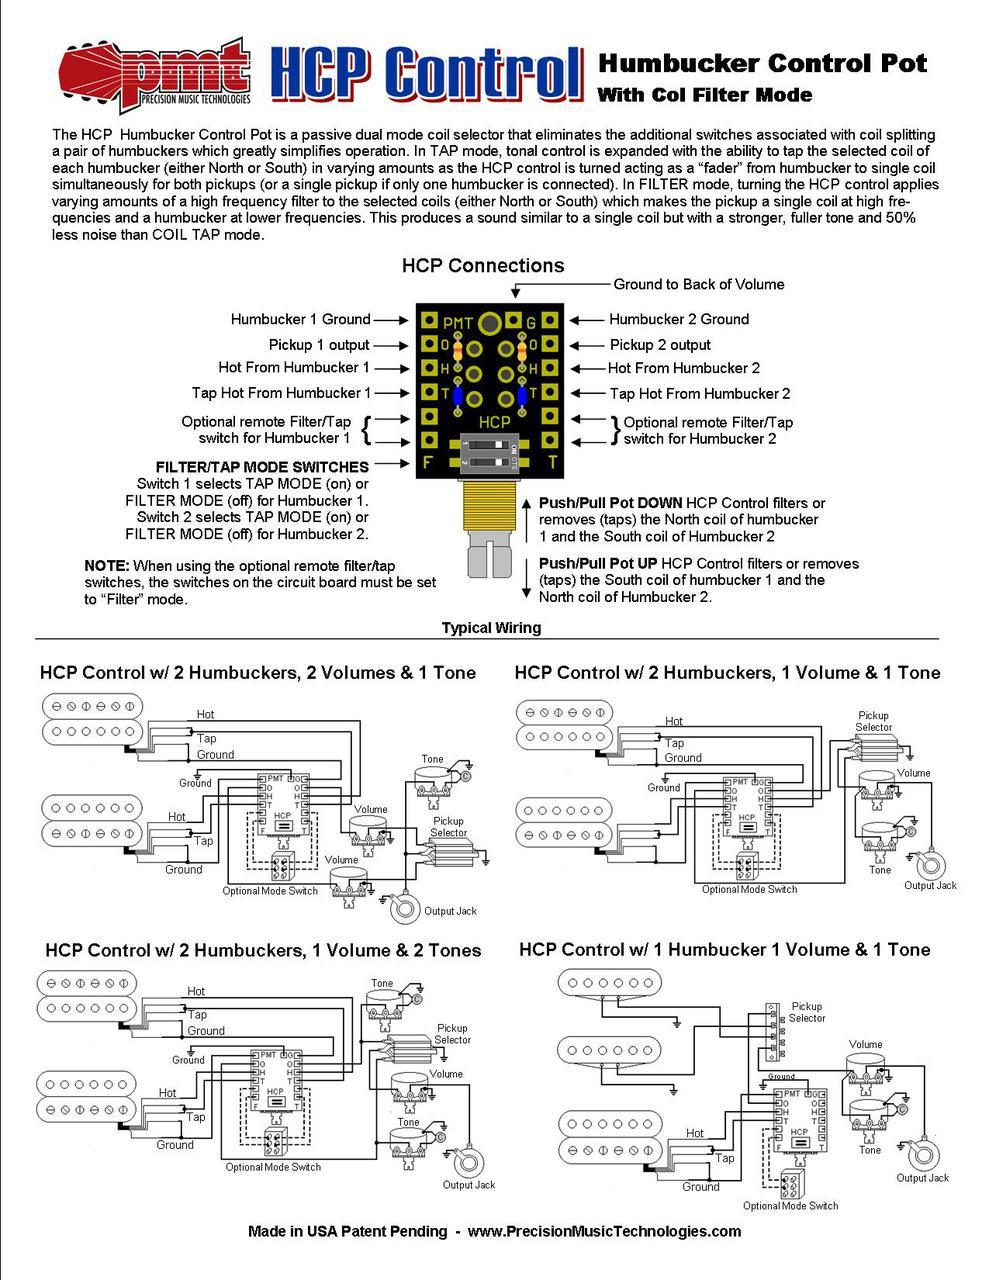 HCP Humbucker Control Pot w/ Coil Filters=Instructions